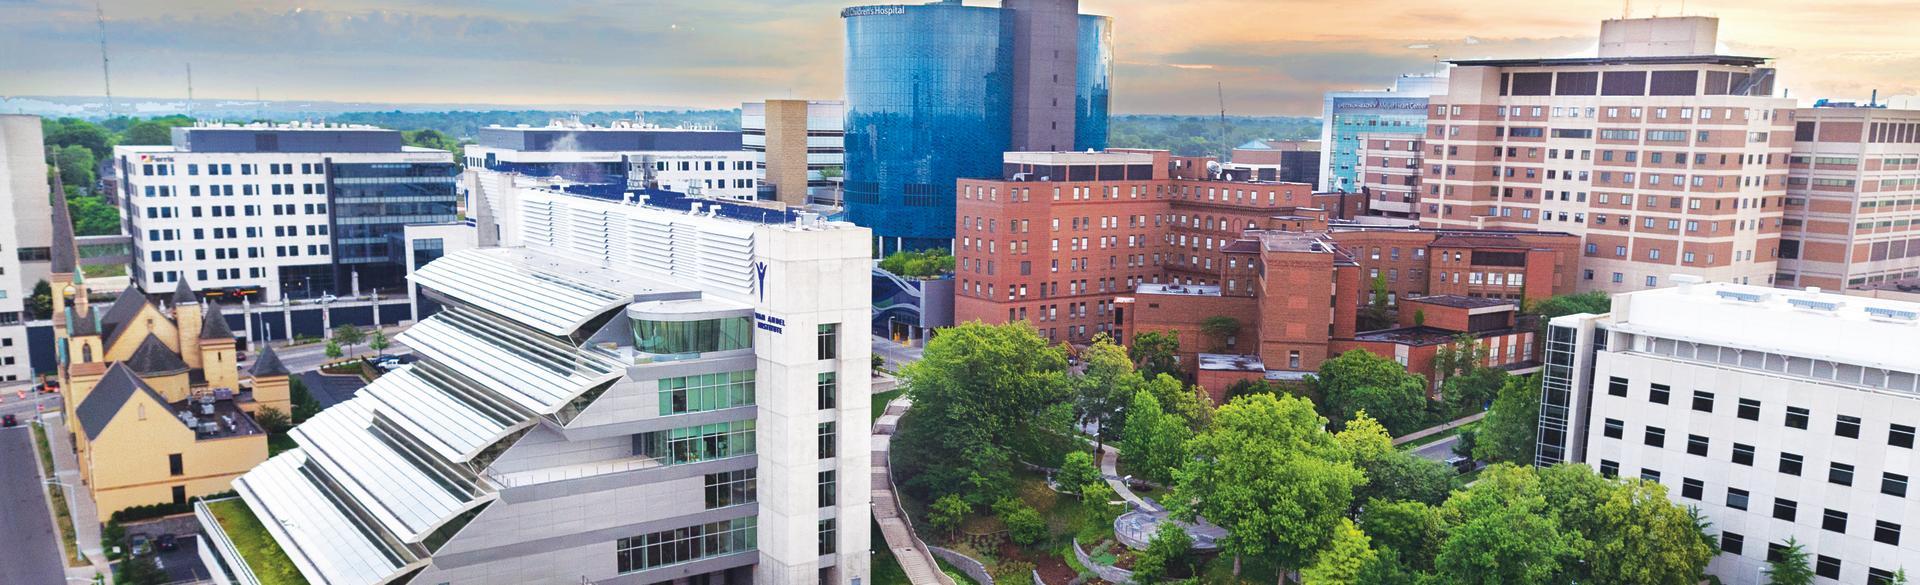 Grand Rapids Cityscape - Medical Mile